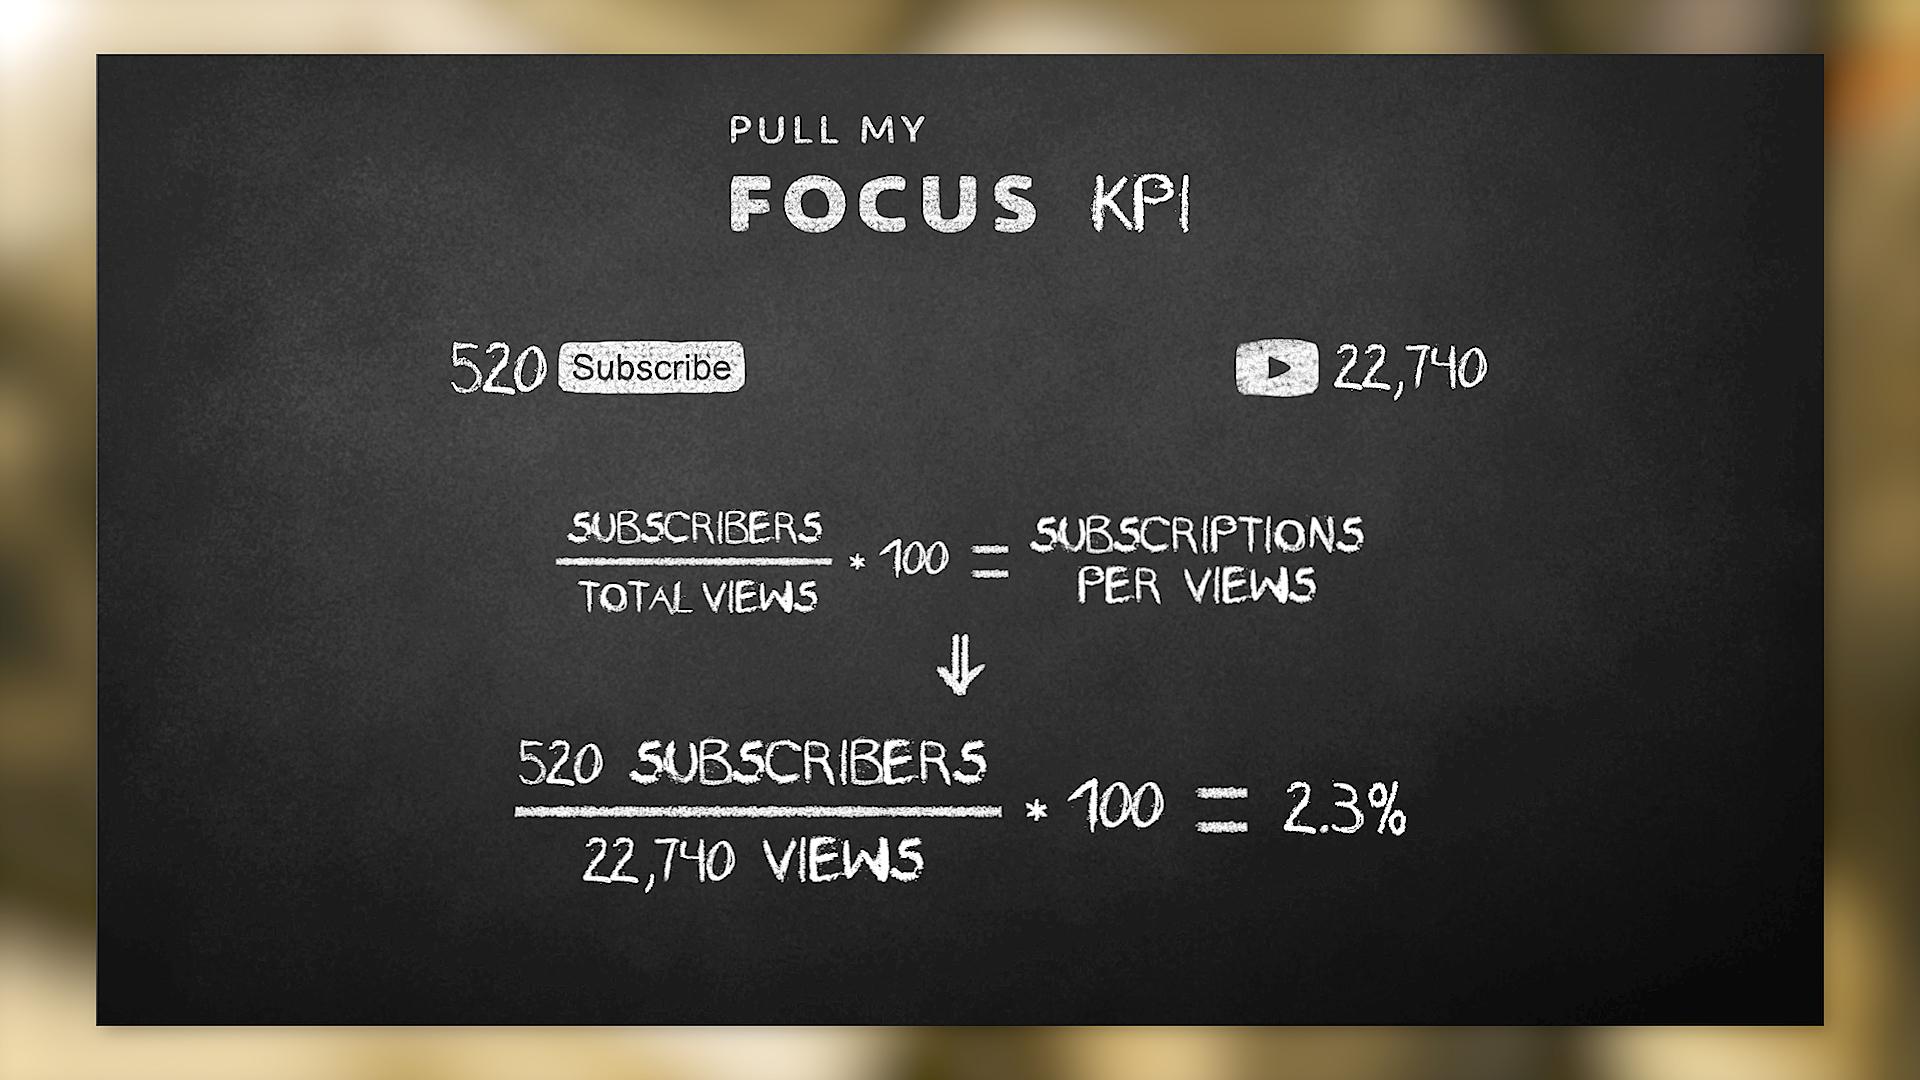 052 Youtube Statistics-PMF-Thumbnail-1920x1080.jpg